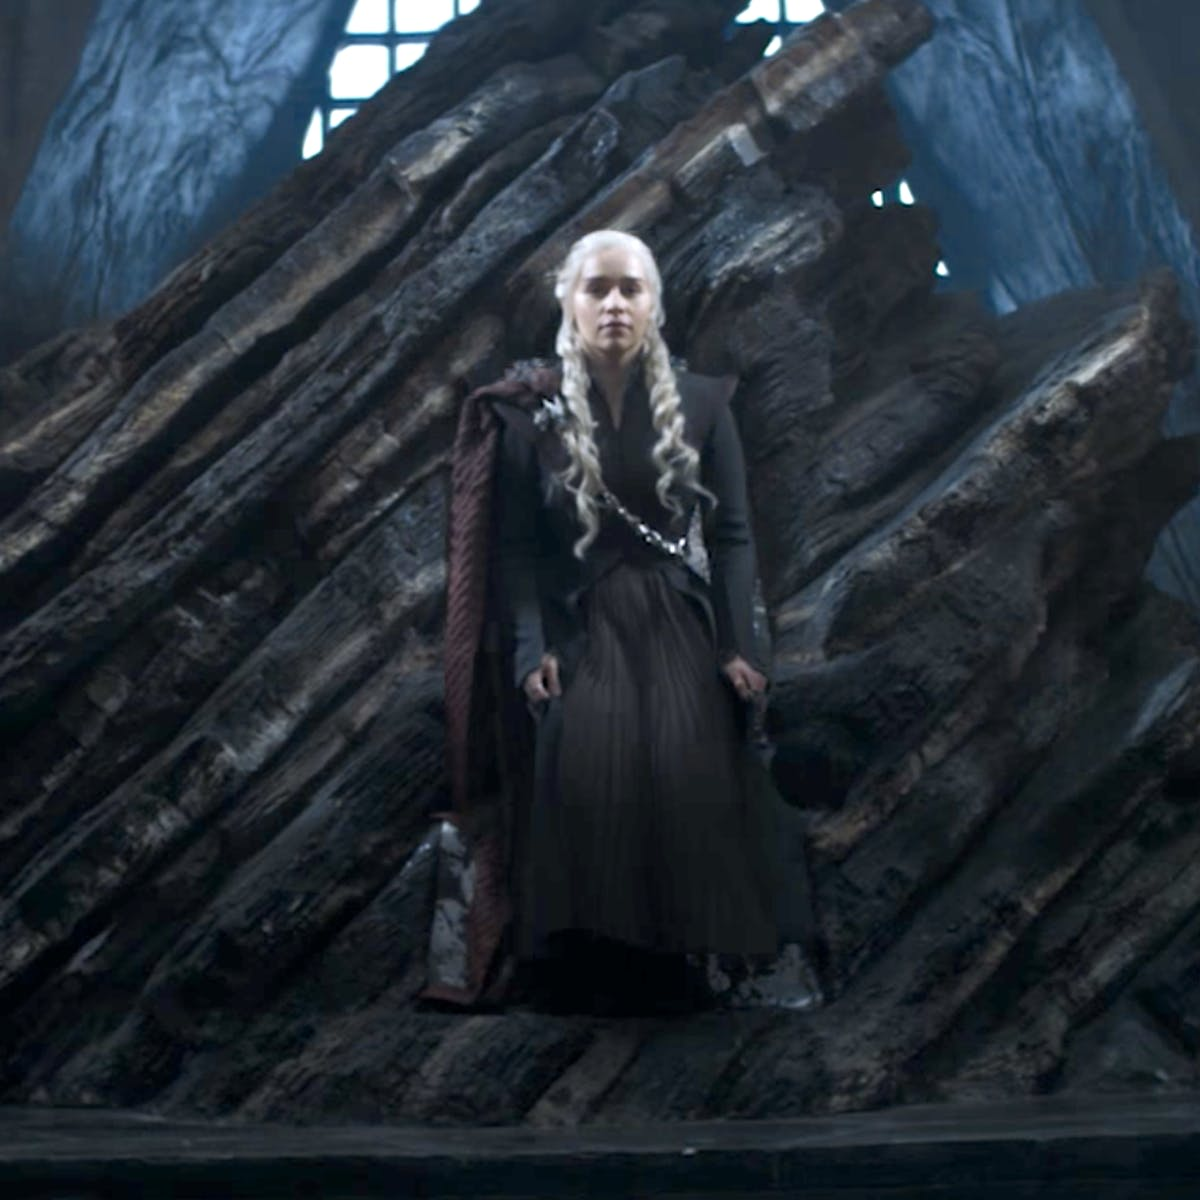 Where Is Daenerys's Throne in the New 'GoT' Season 7 Teaser?